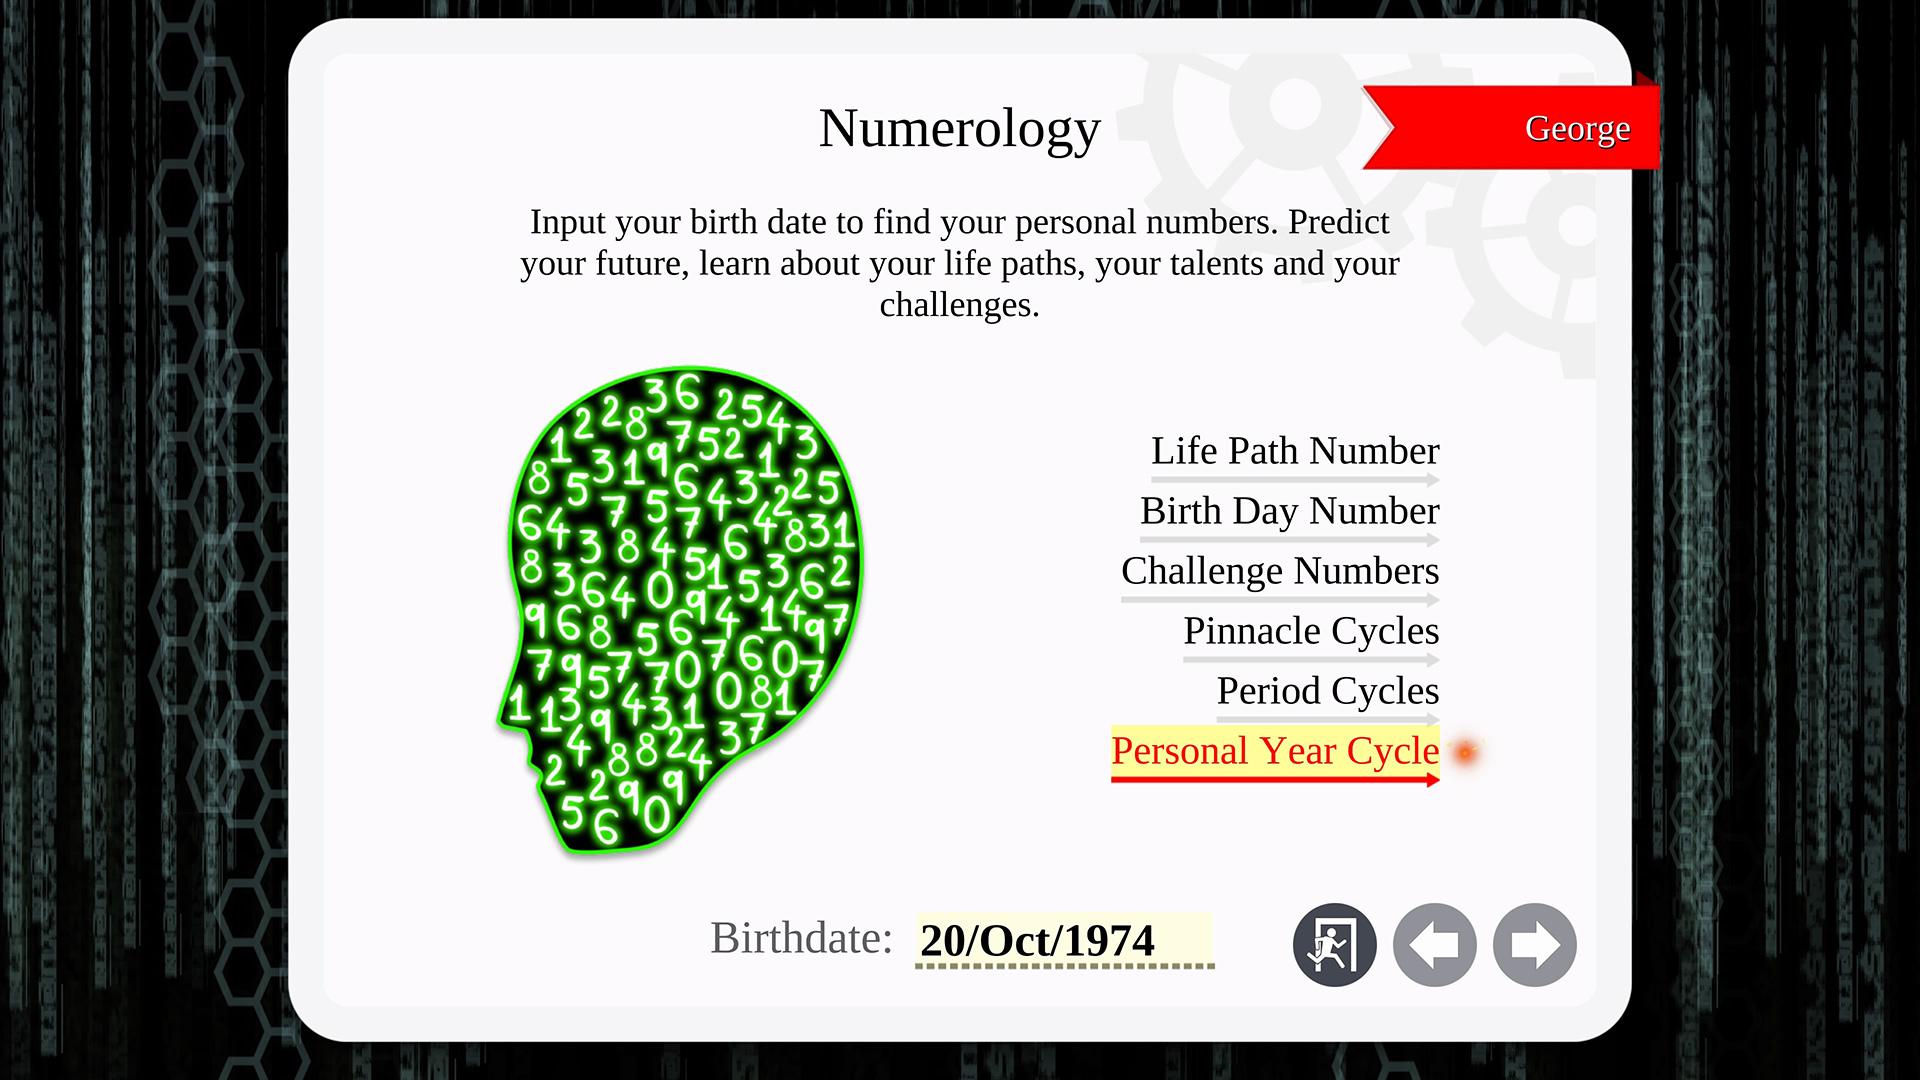 numerology matchmaking gratis muslimske dating sites ireland